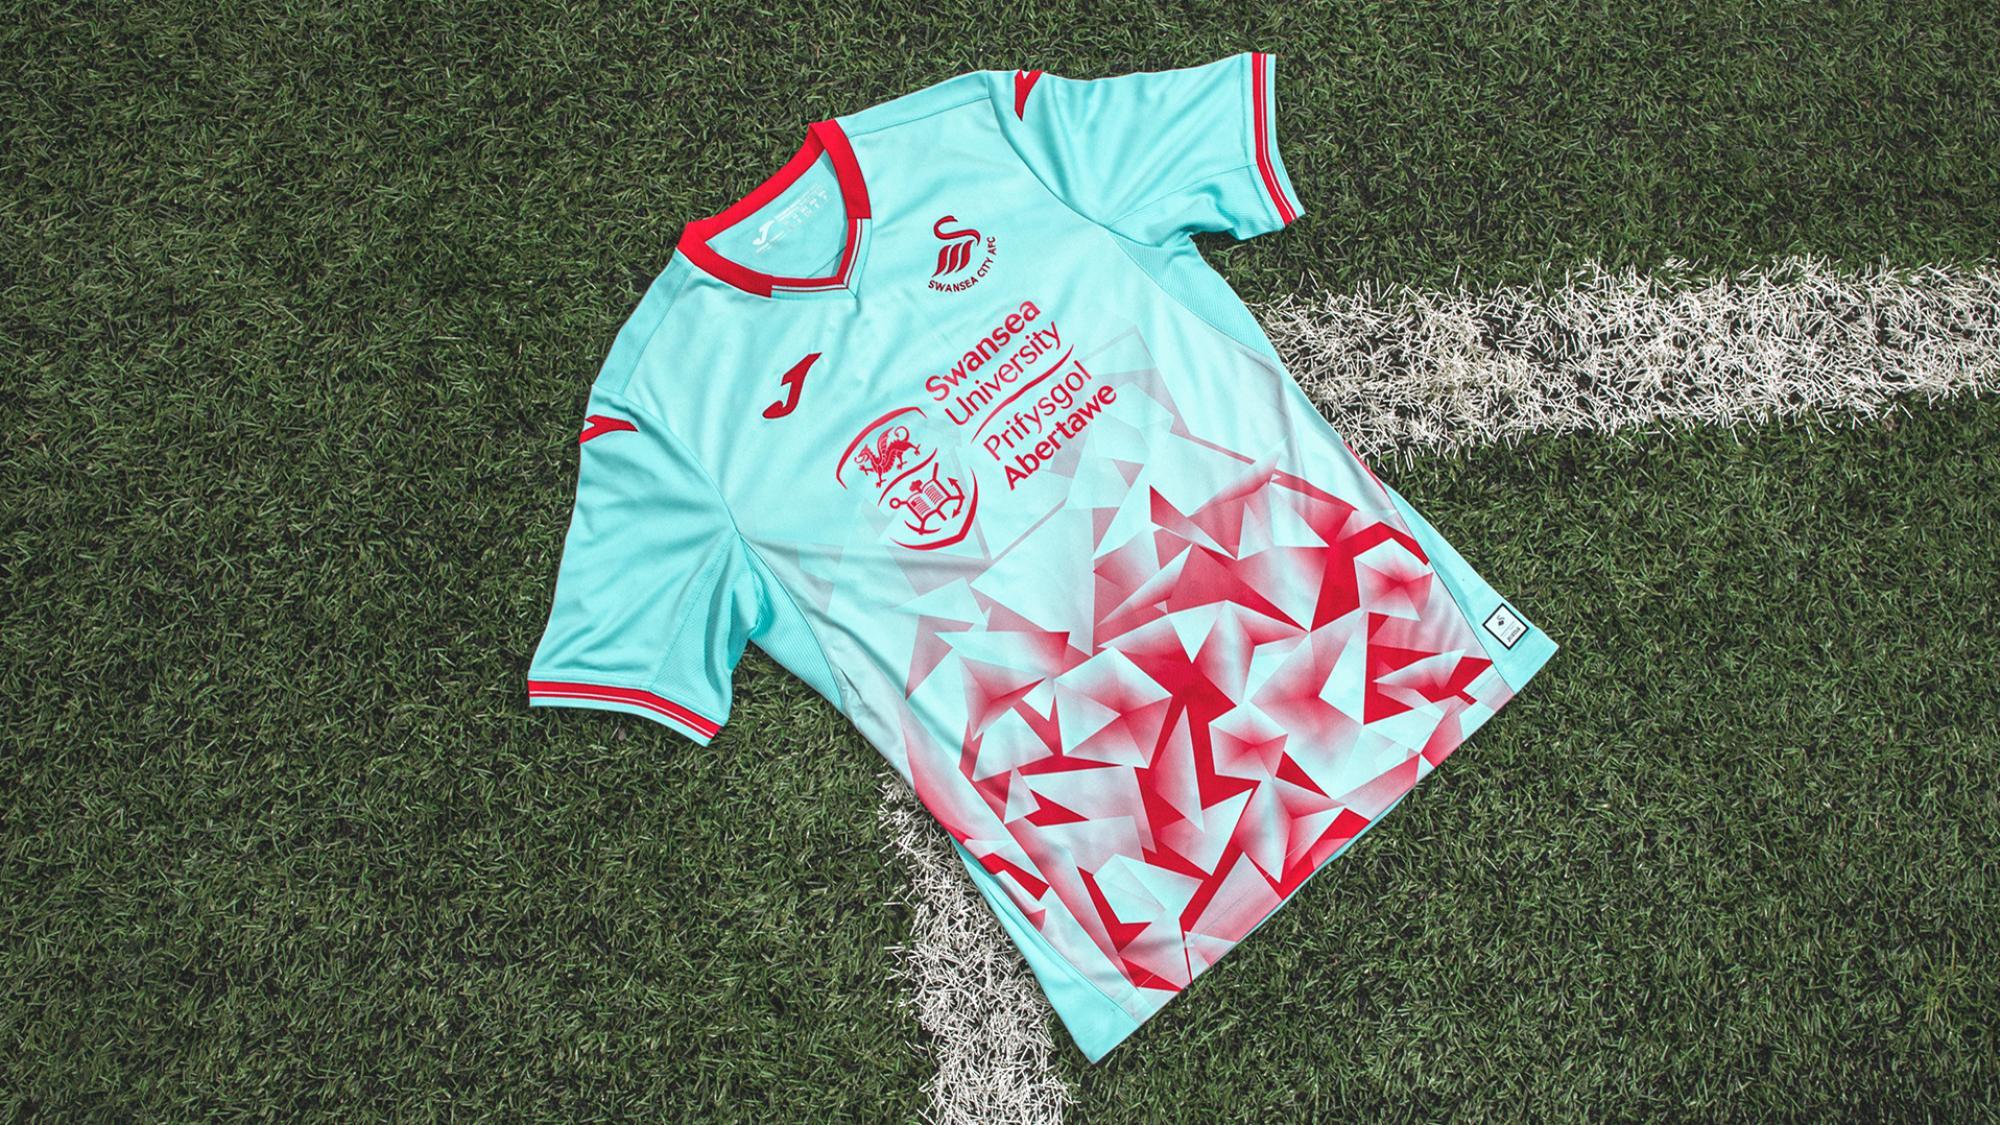 Swansea City 2020-21 Joma Away Kit | 20/21 Kits | Football shirt blog